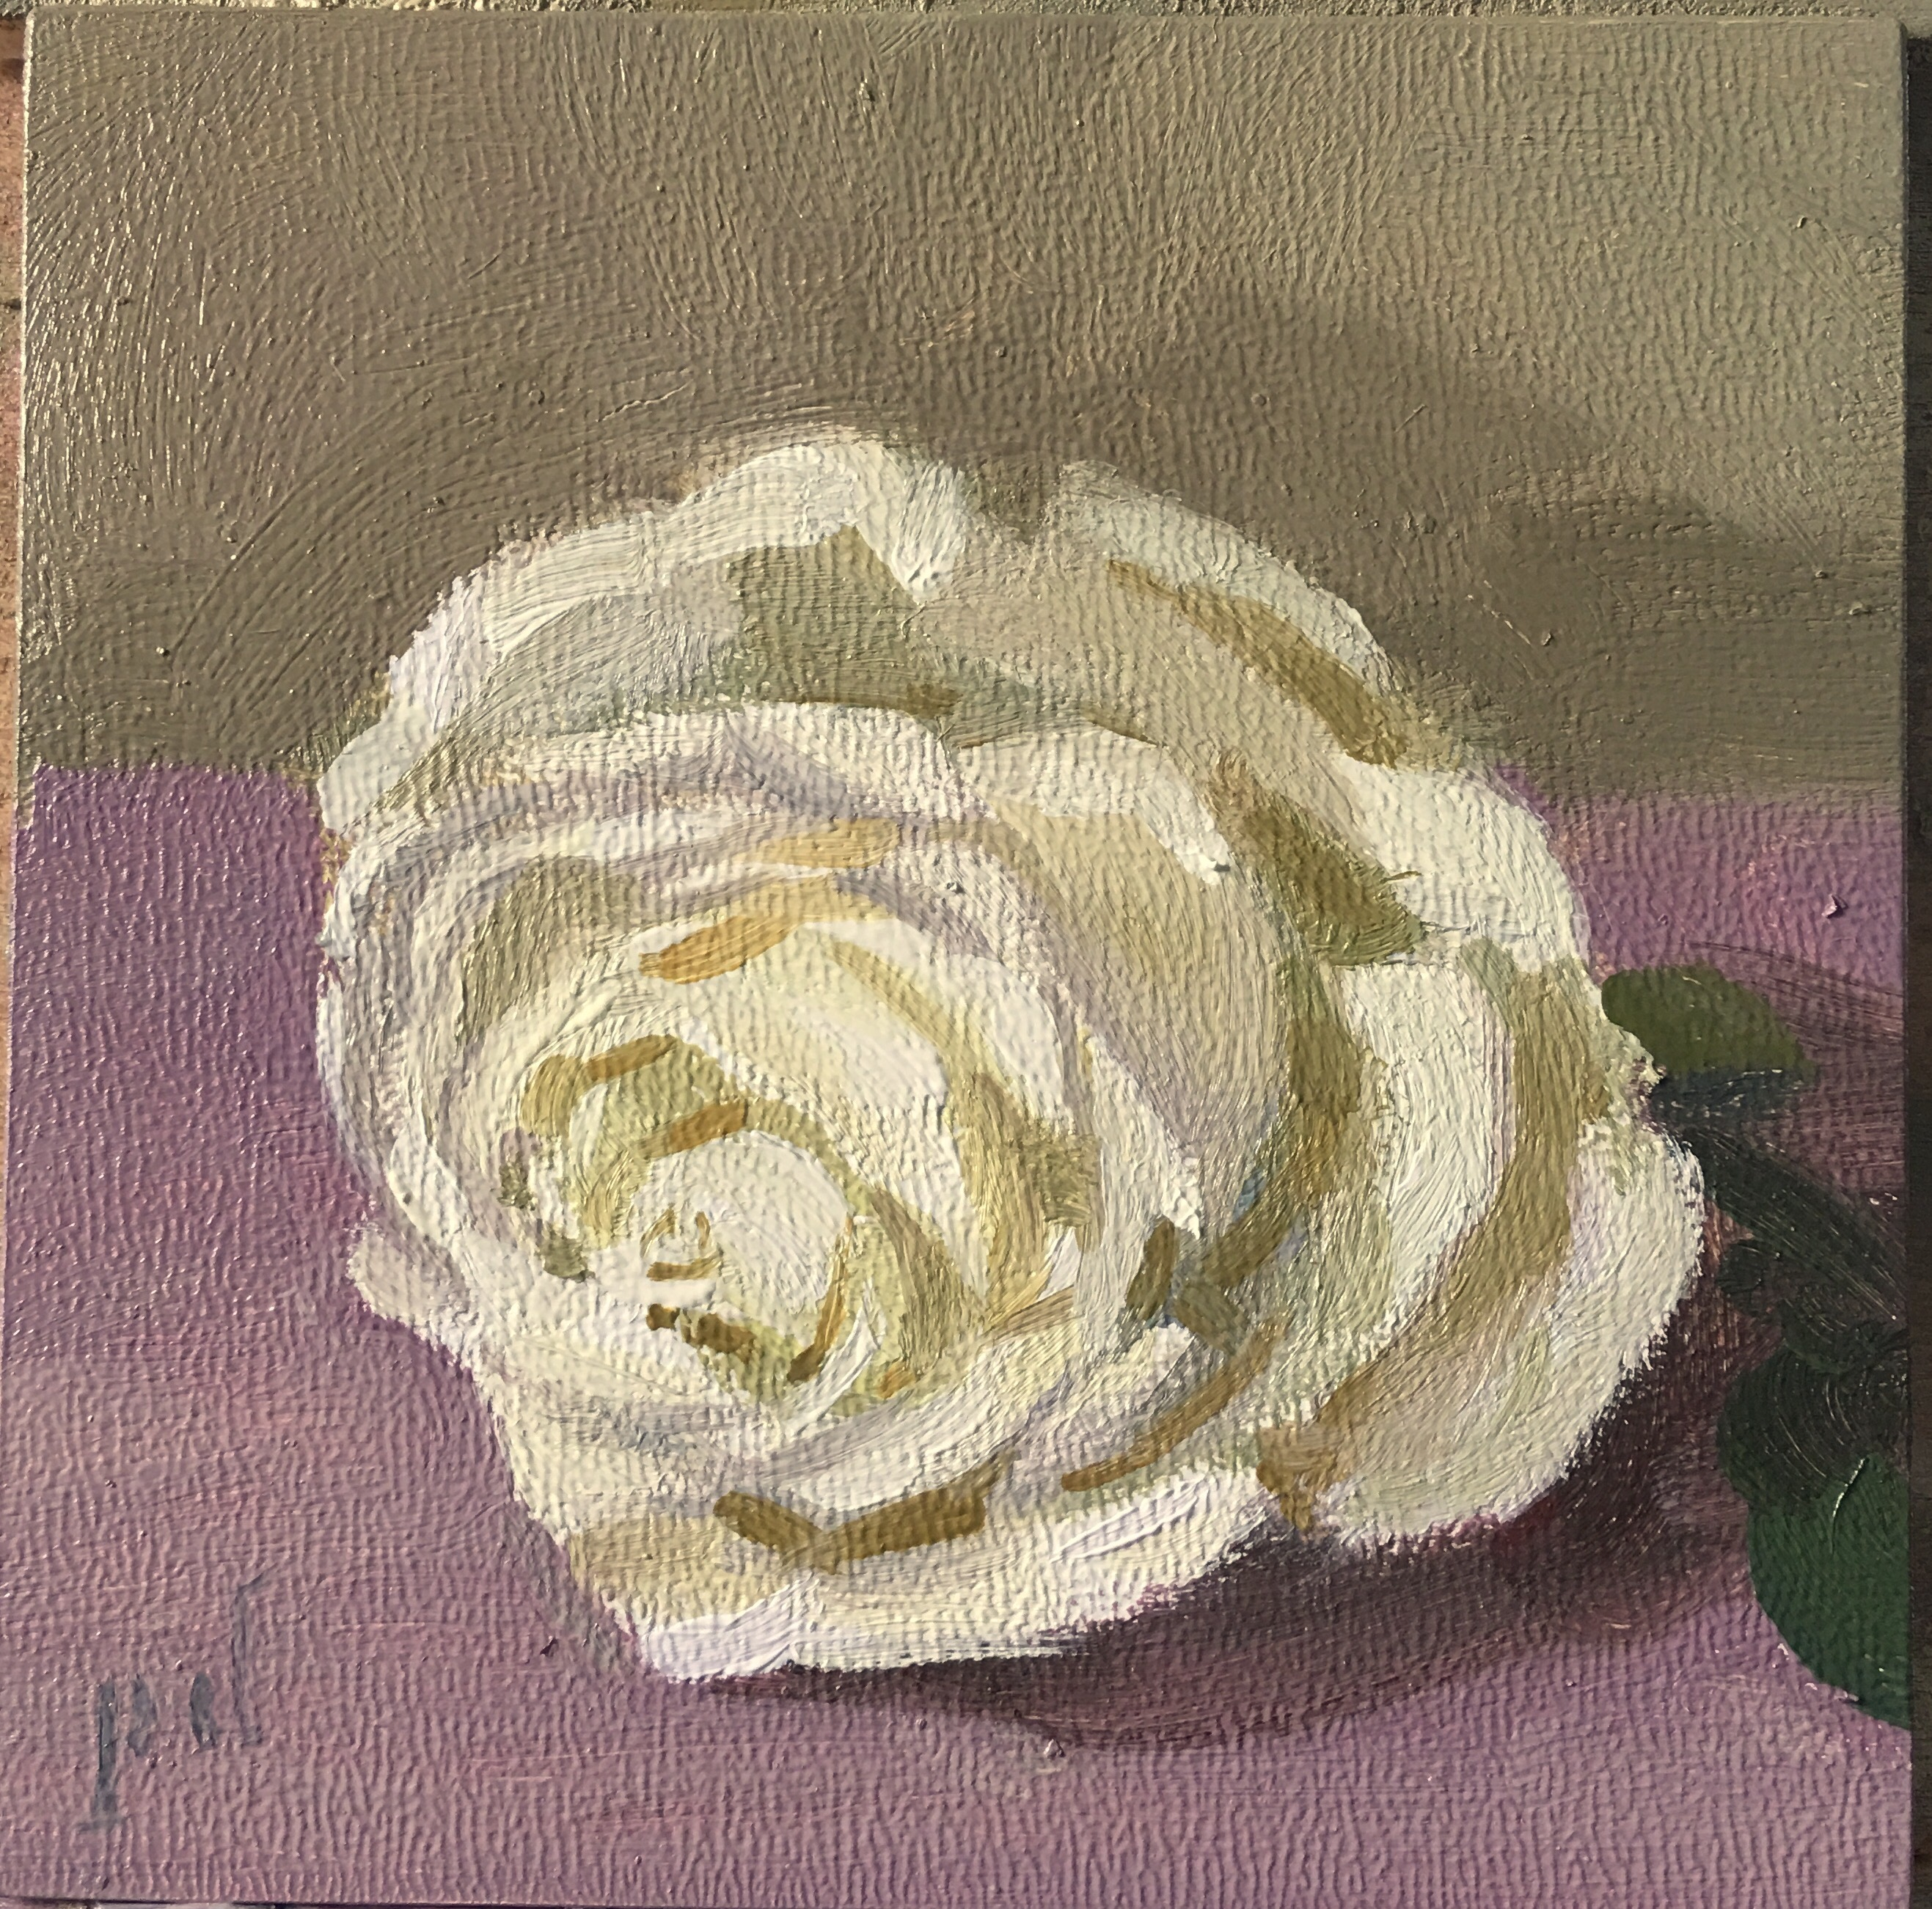 White Rose on Purple